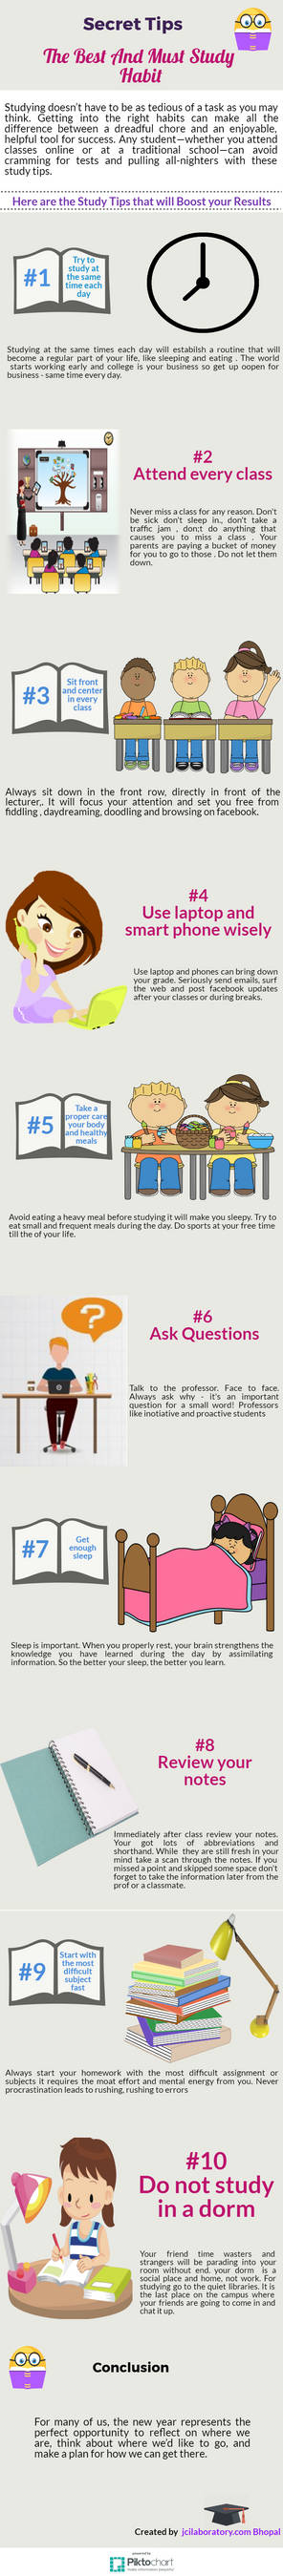 Secret Tips The Best And Must Study Habit